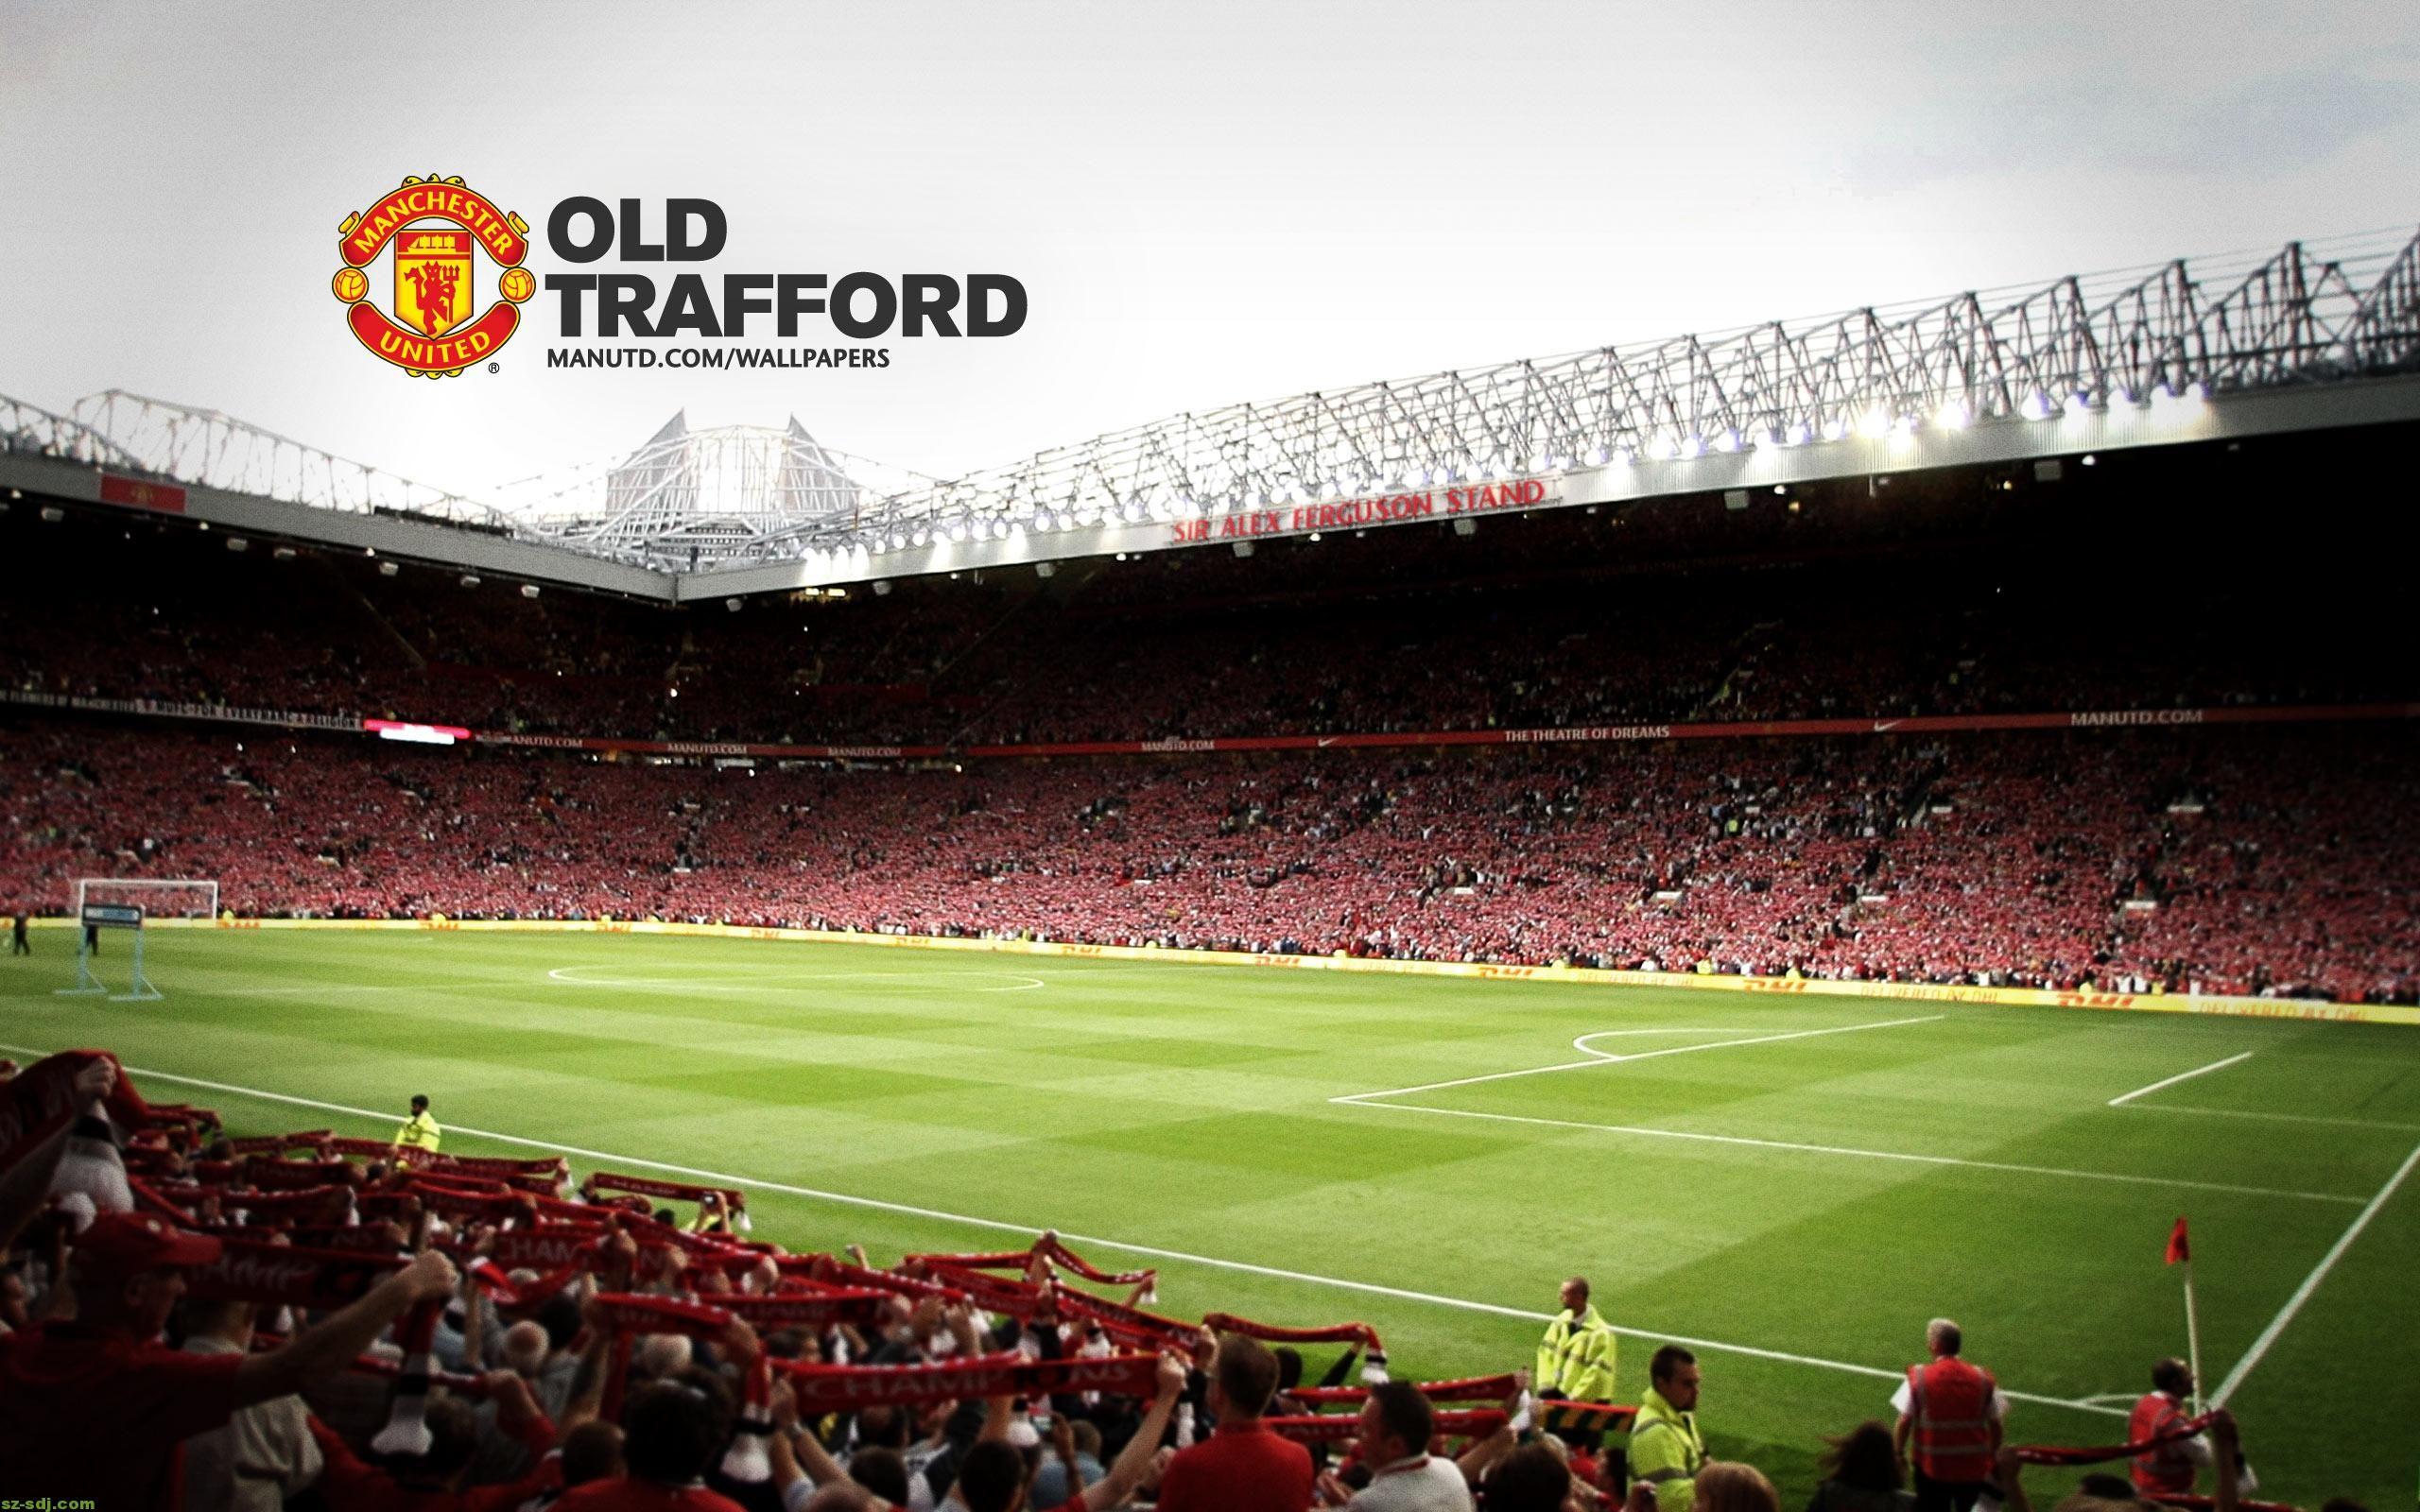 Man Utd Desktop Wallpaper Manchester United Wallpaper Manchester United Logo Old Trafford